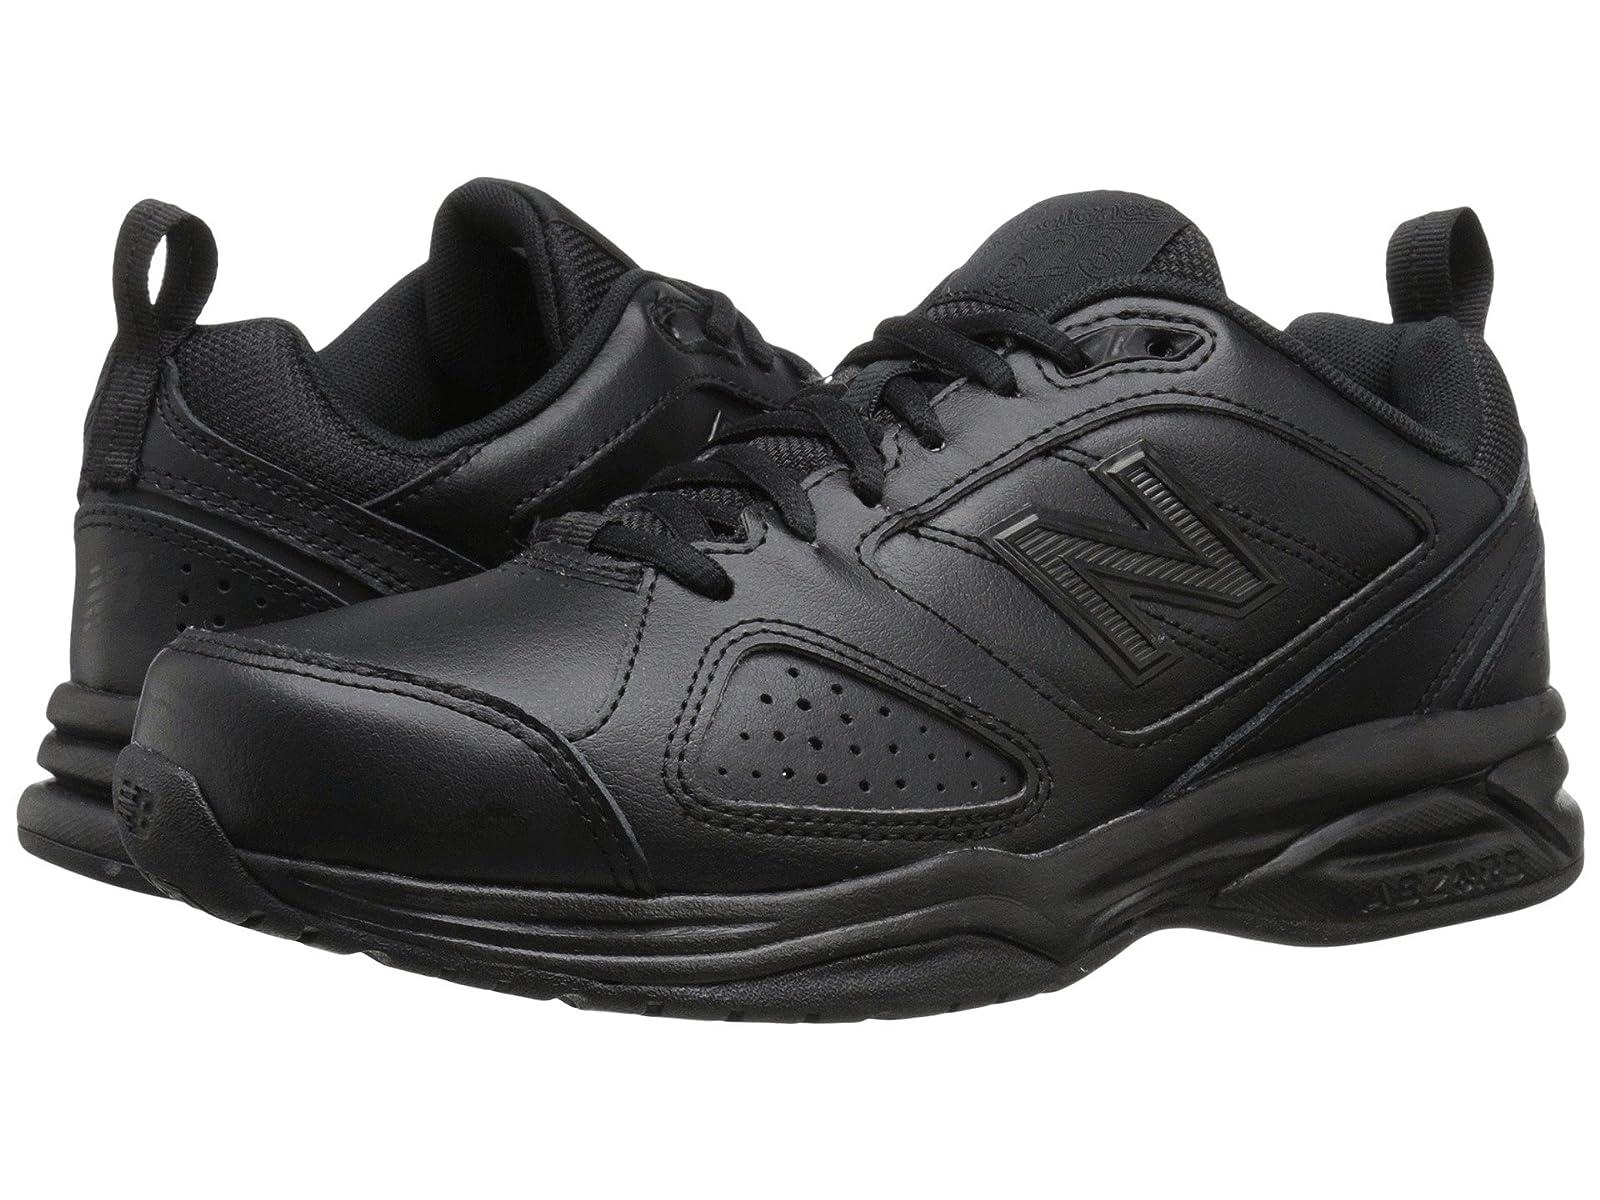 New Balance WX623v3Atmospheric grades have affordable shoes